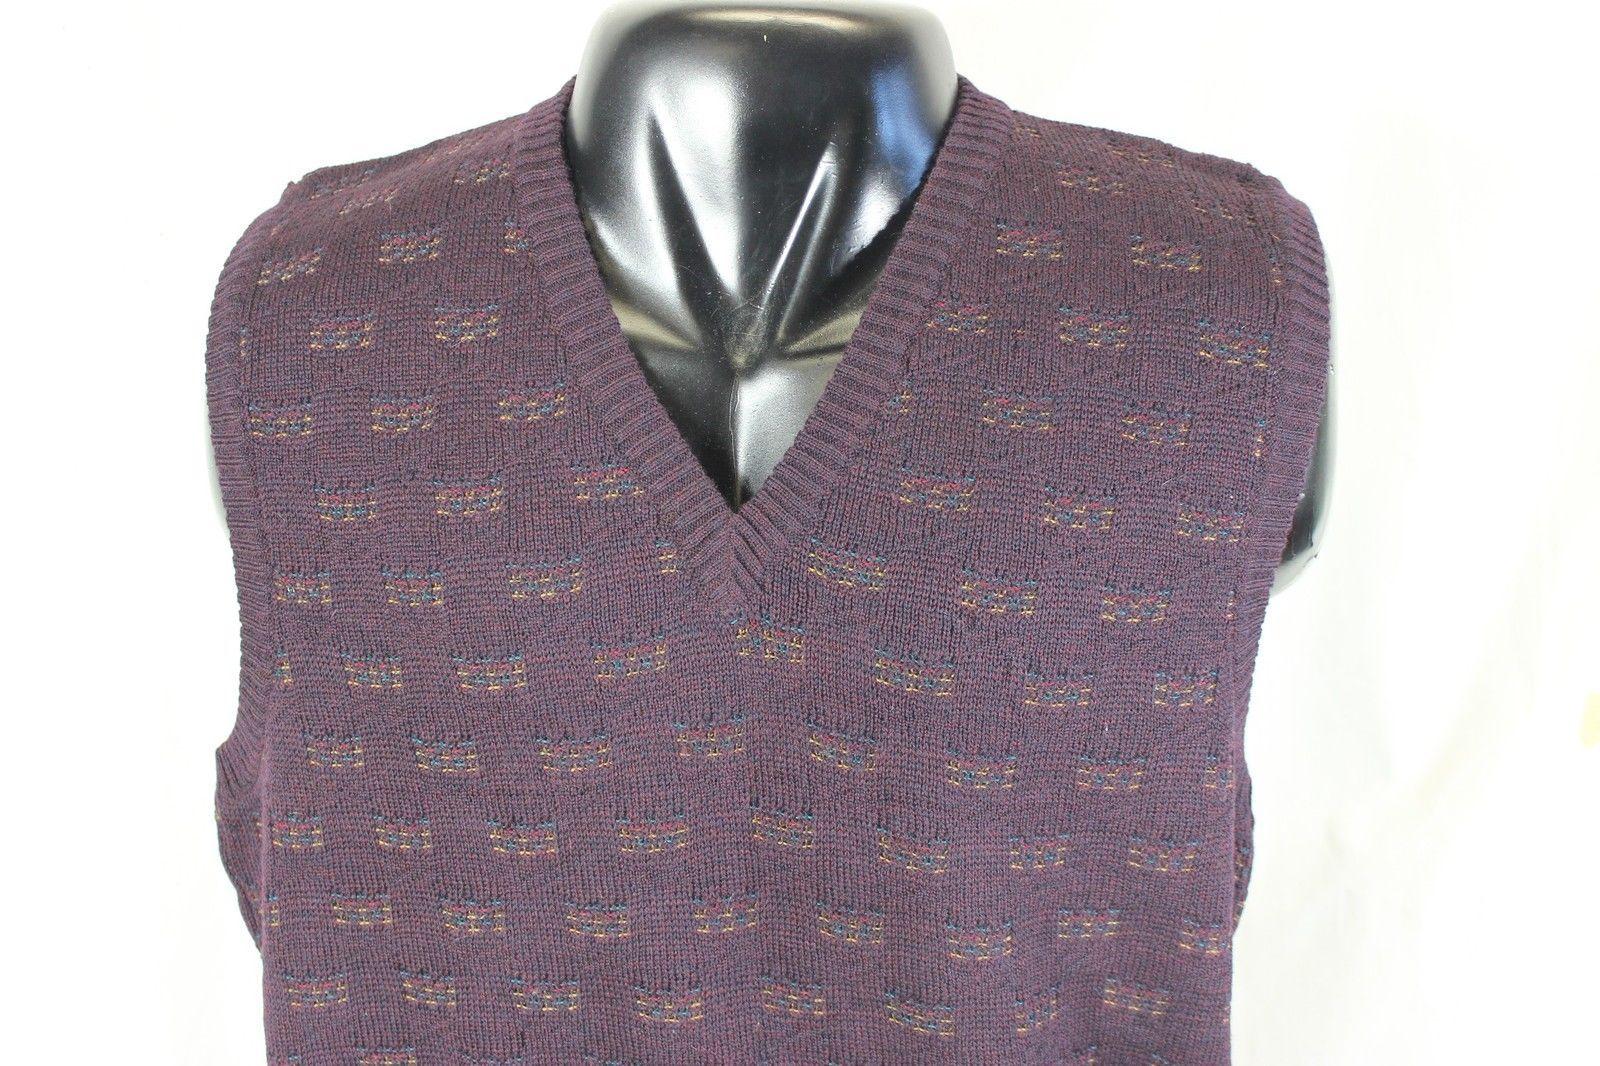 Vtg 90s Nordstrom V Neck Sweater Vest Xl and 14 similar items